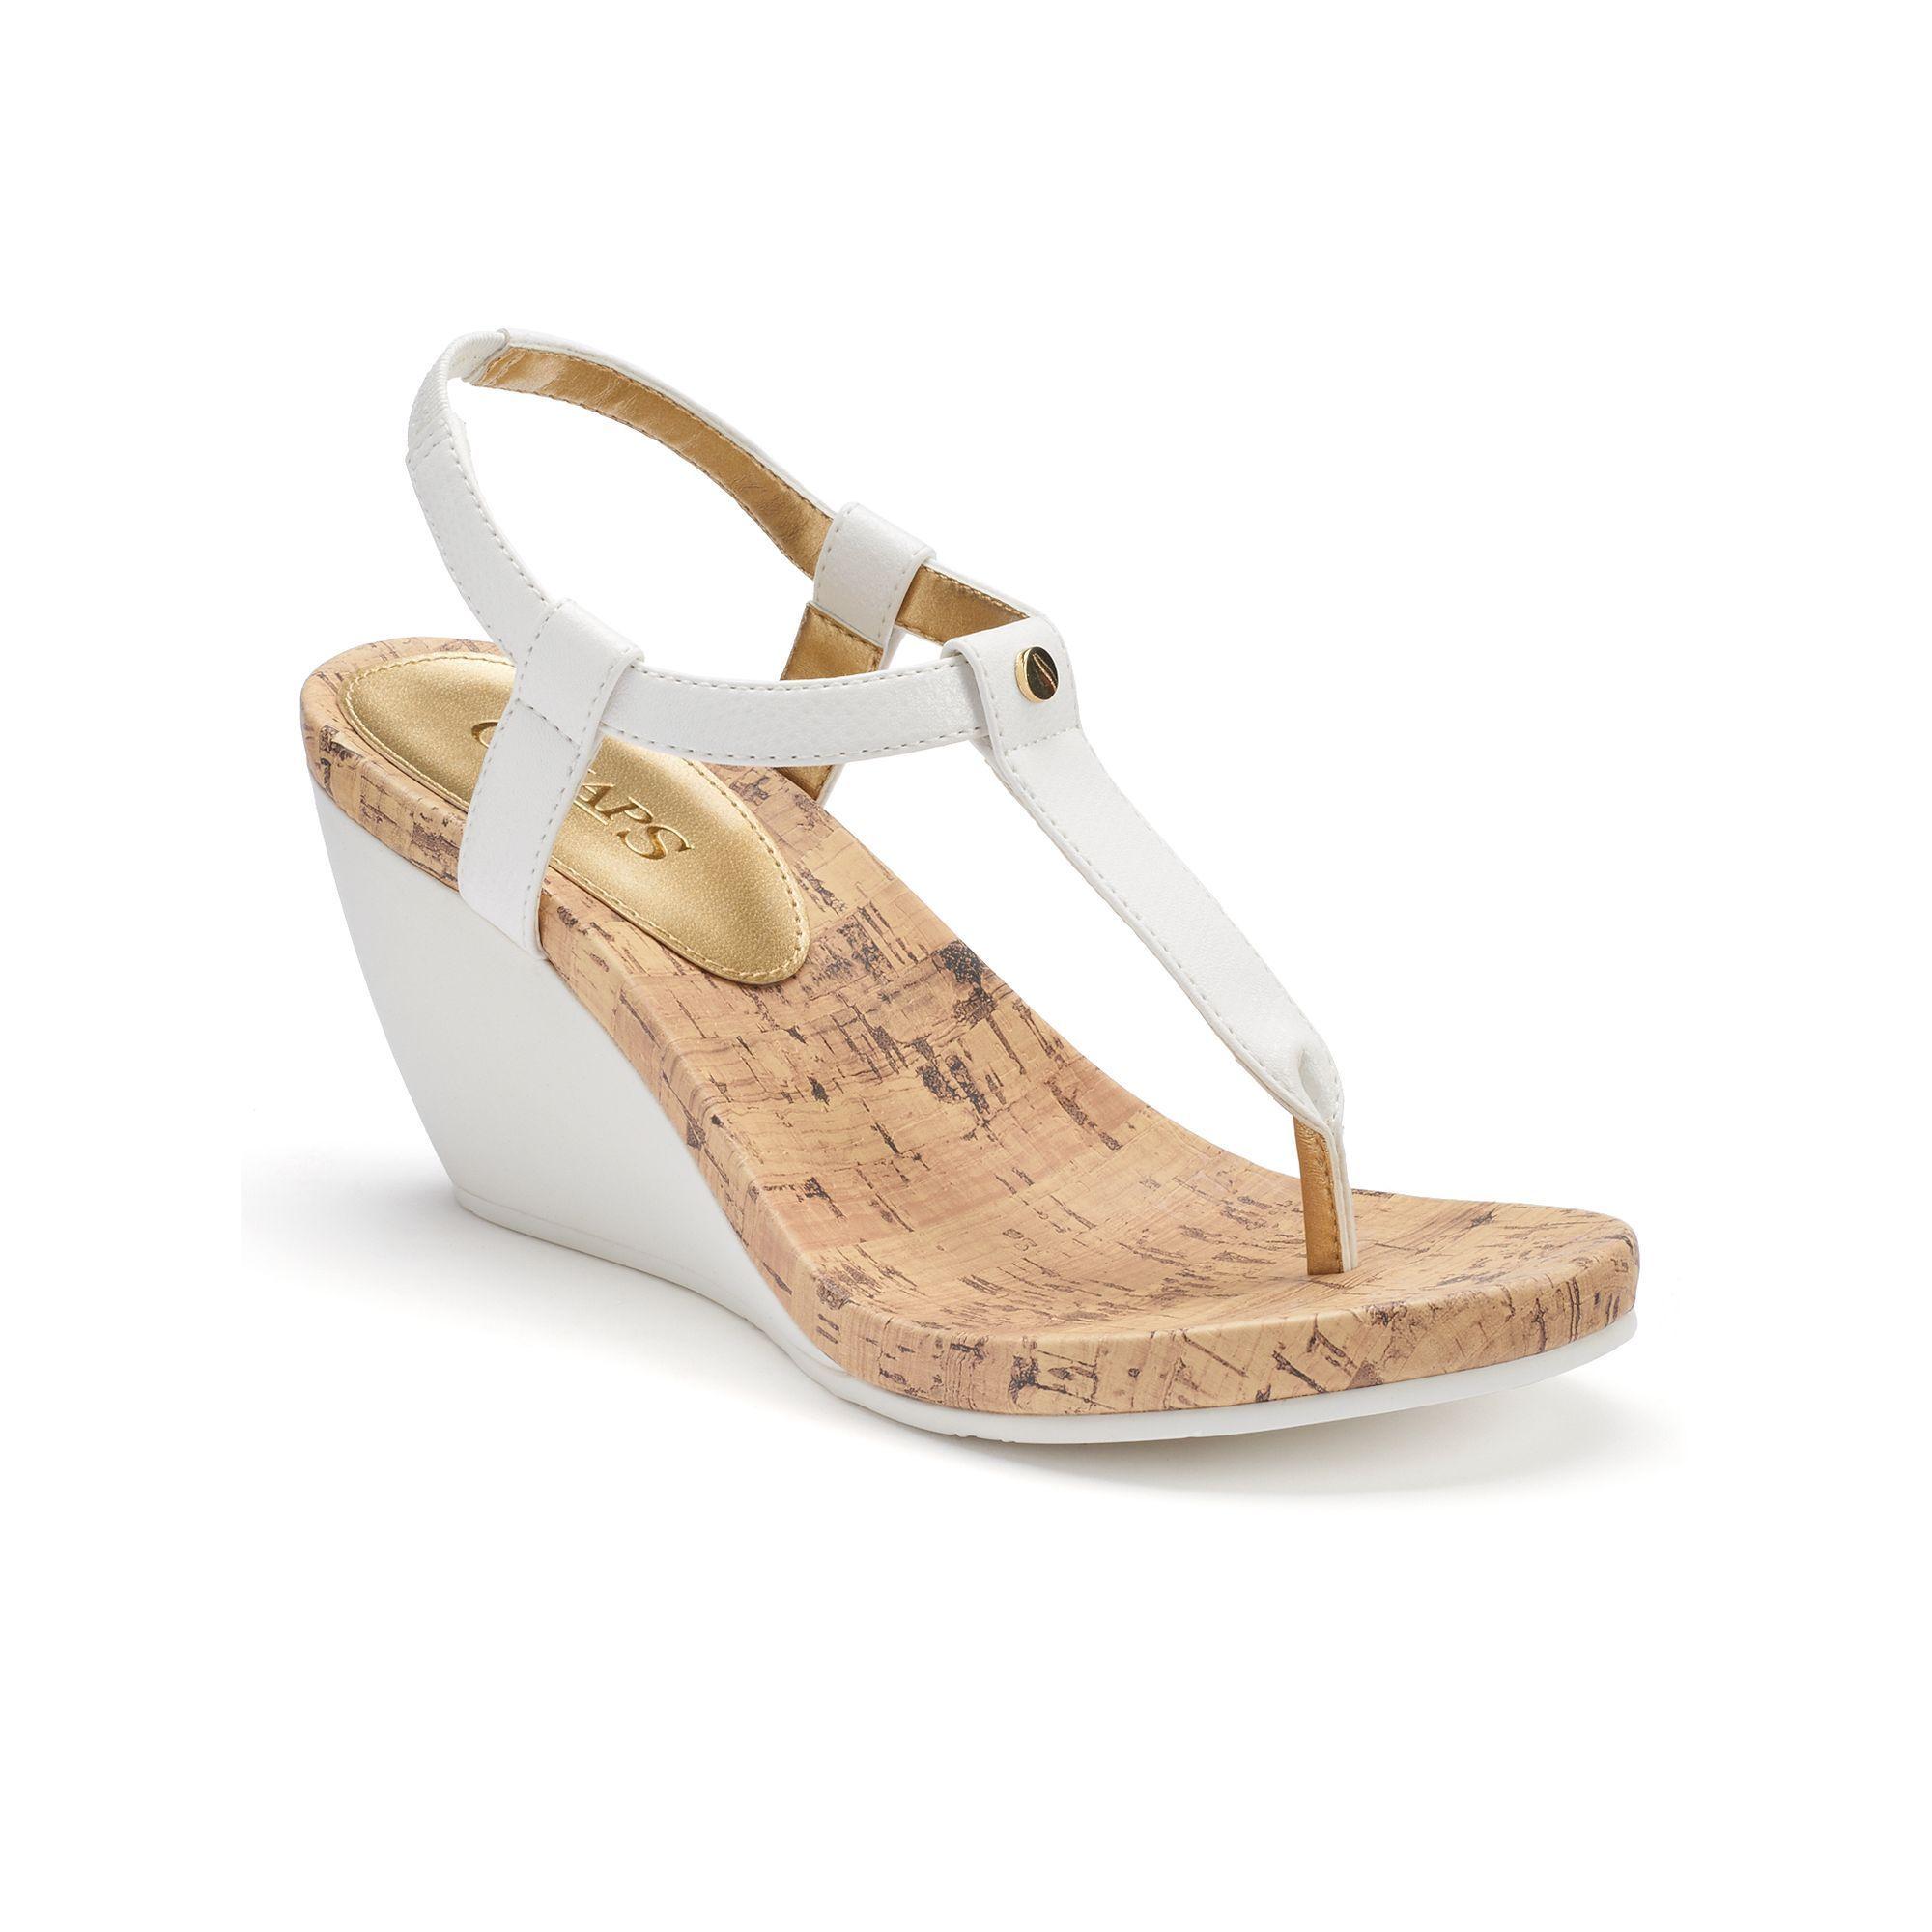 a2baf82b183 Chaps Raevyn Women s Slip-On Wedge Sandals